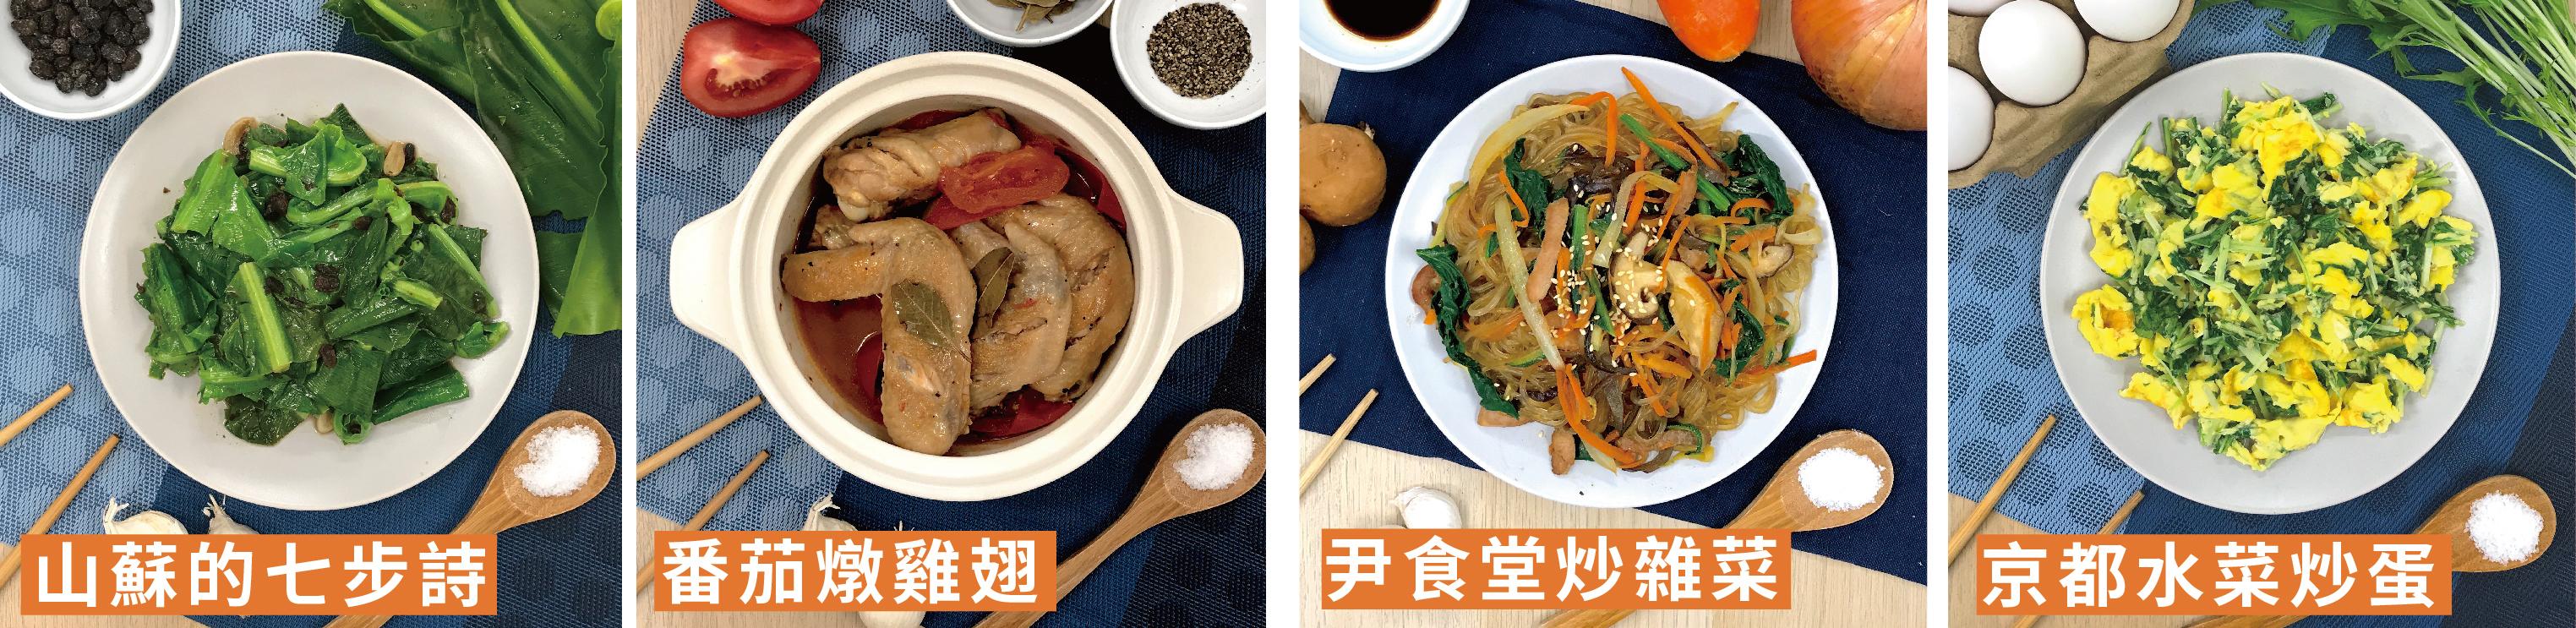 FreshRecipe享廚好食新鮮快煮方案2020年1月20日週次菜單